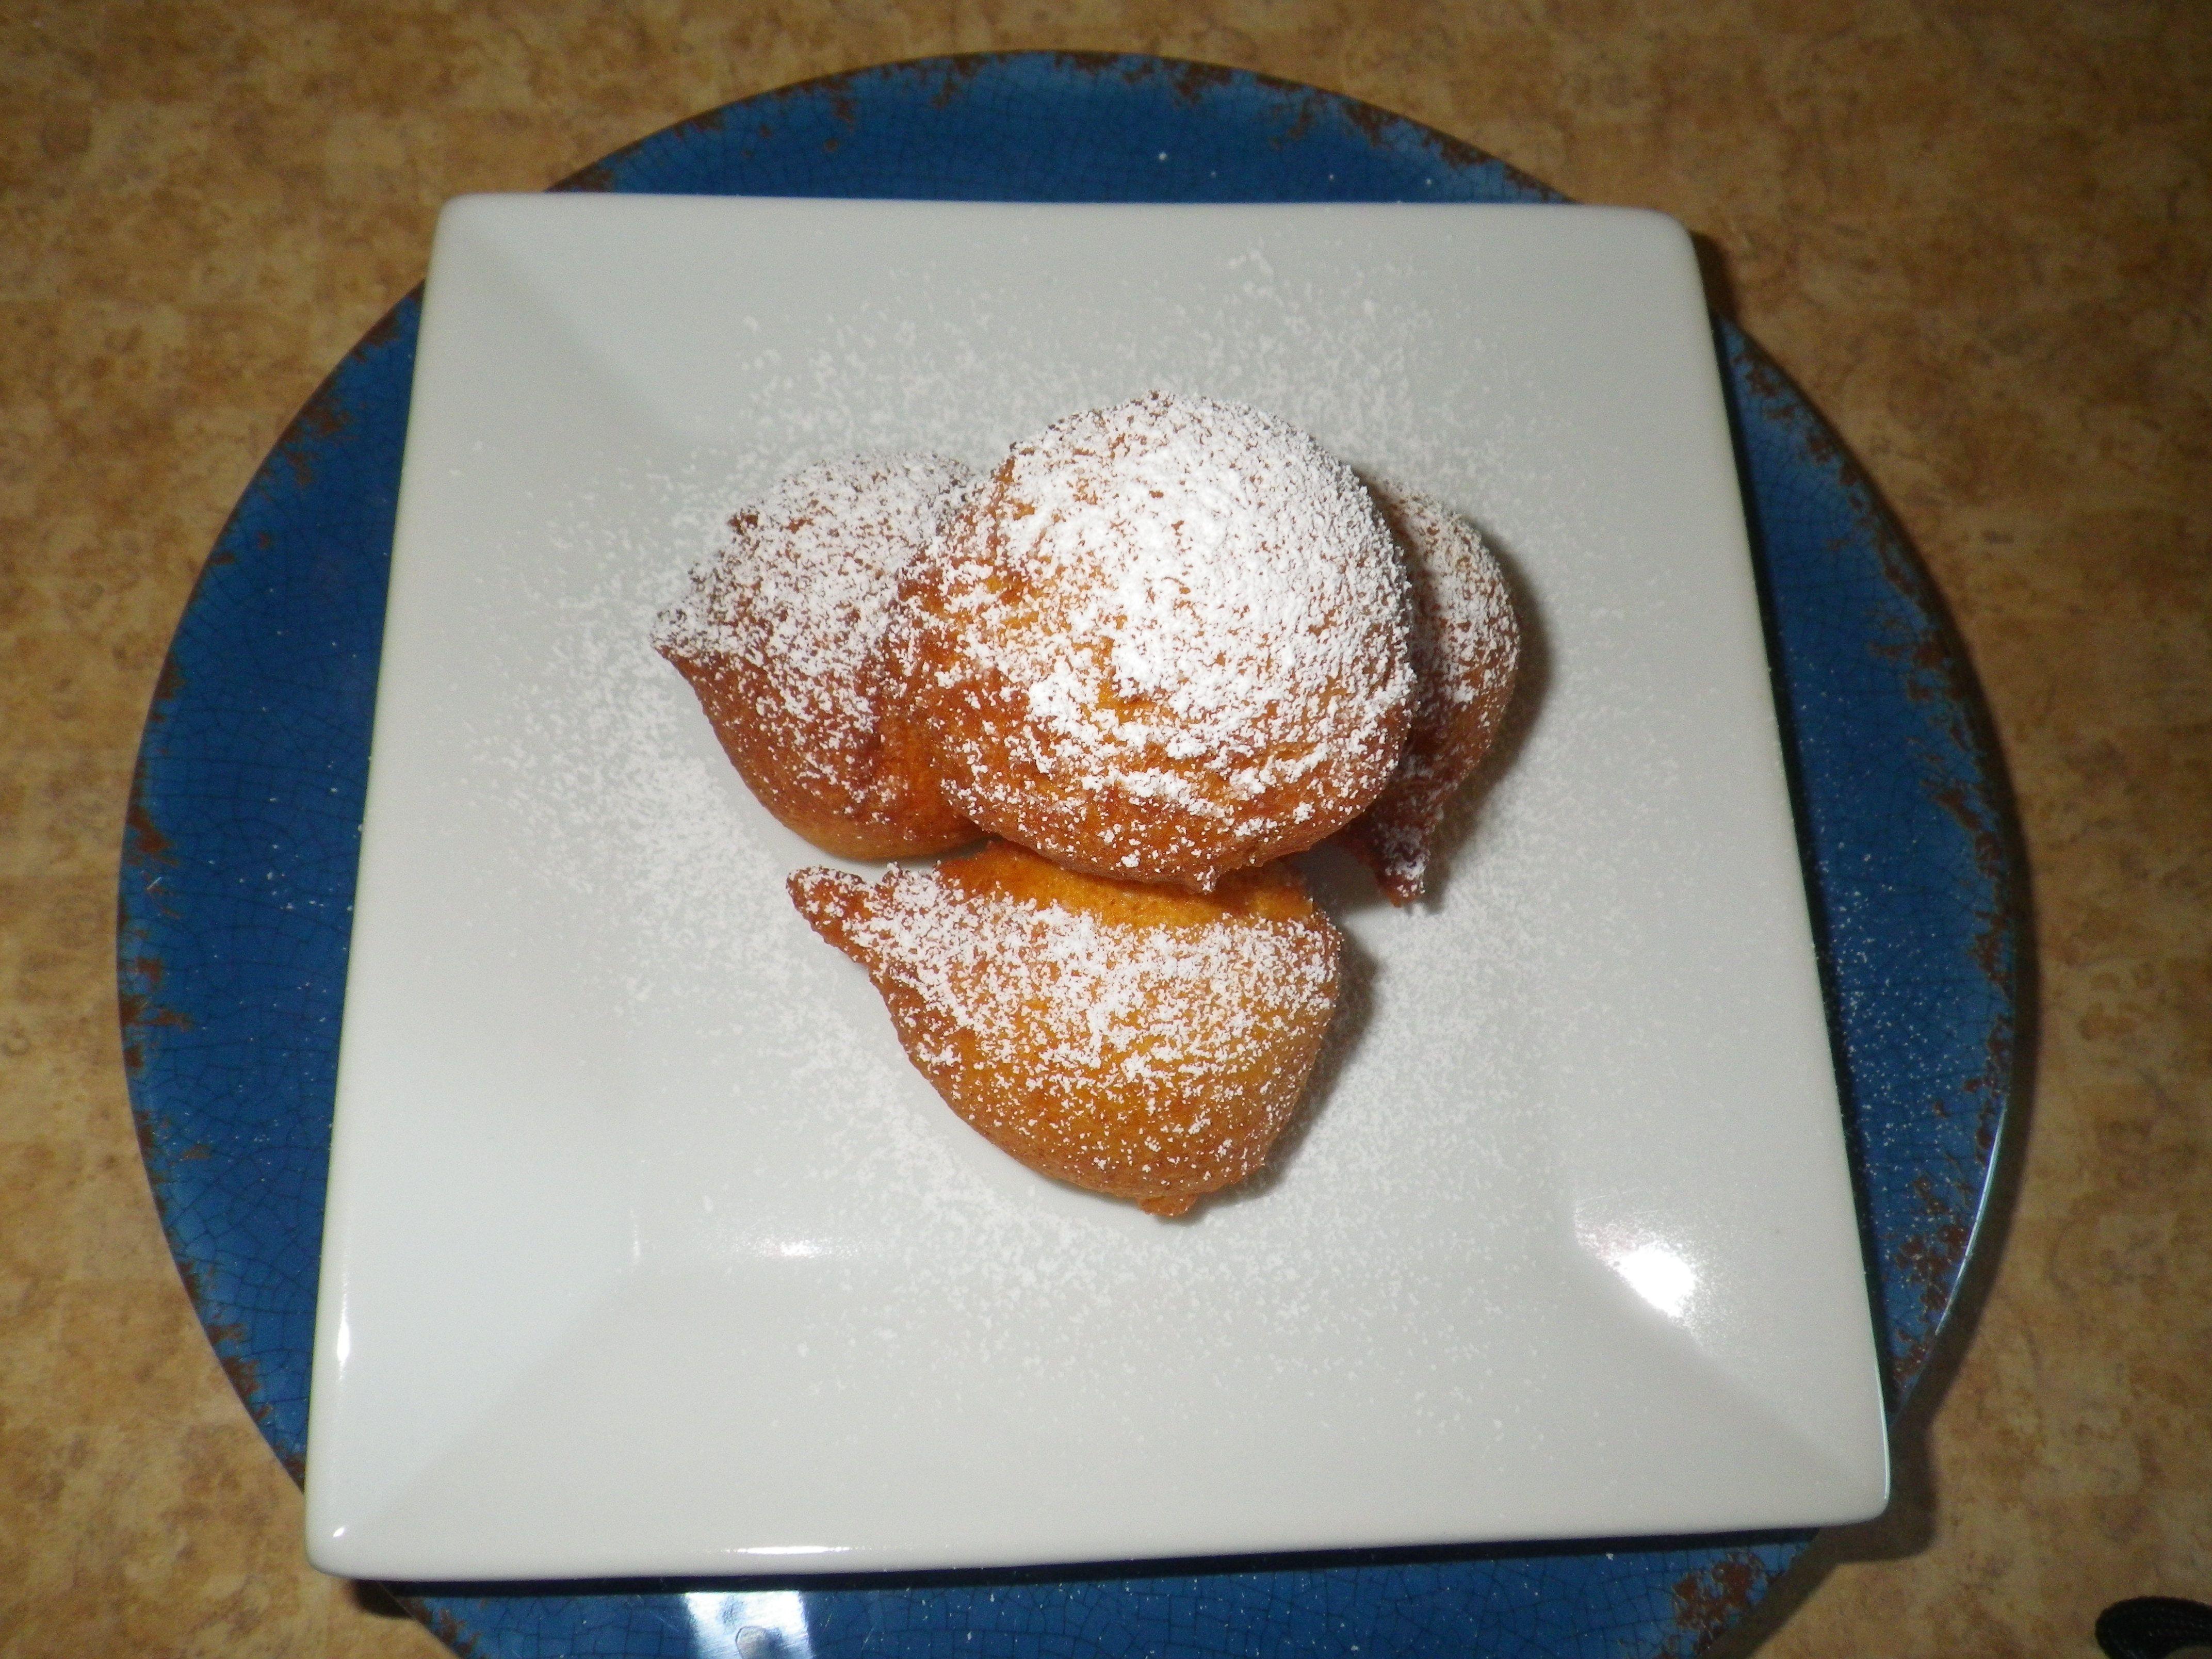 Zeppoles- Baking my way through my travel bucket list. Recipe at confectionsandcookiesblog.wordpress.com